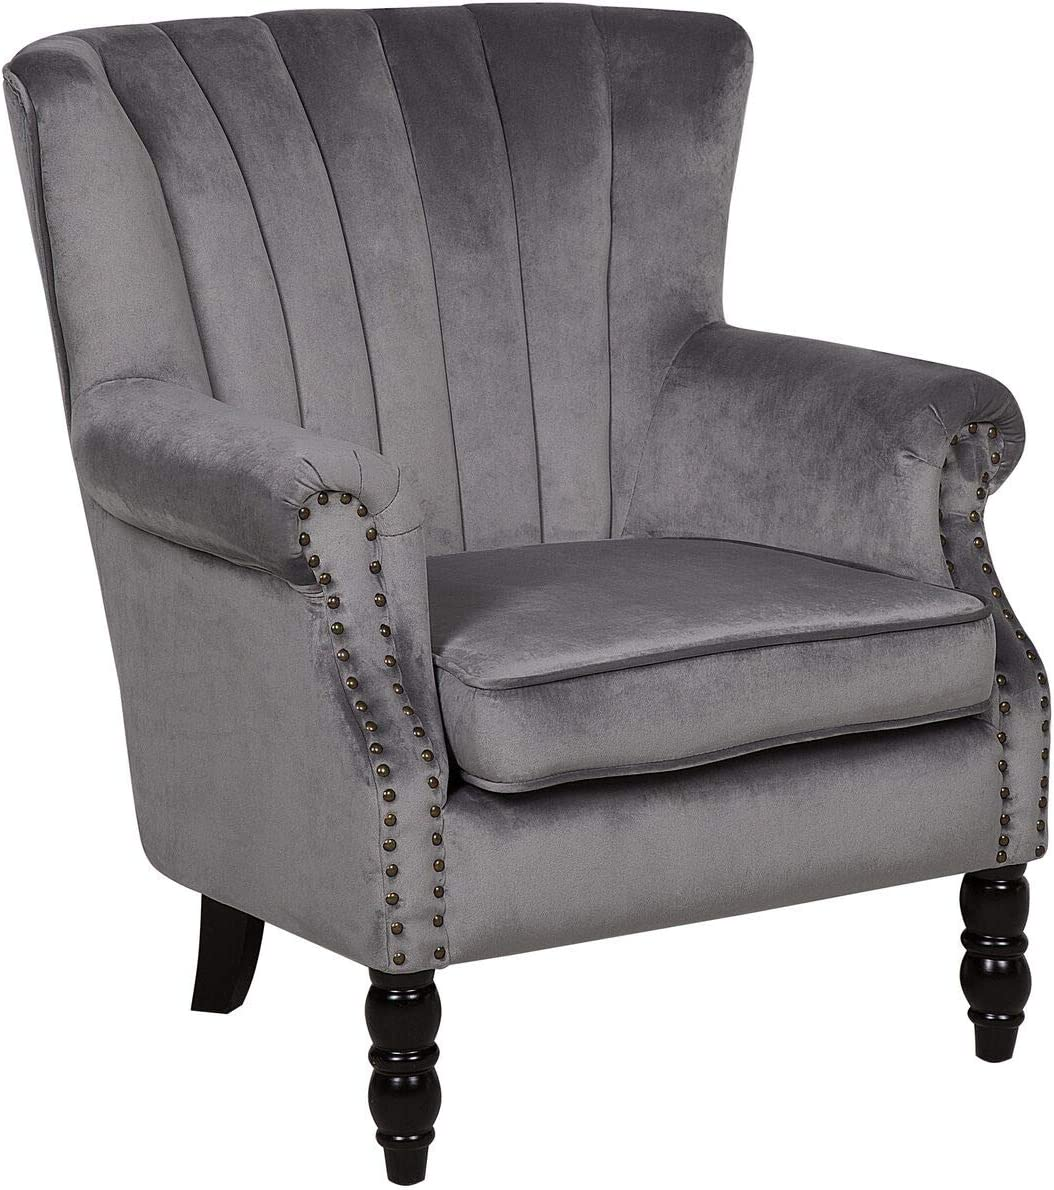 Beliani Modern Velvet Wingback Chair Grey Scroll Roll Arms Solid